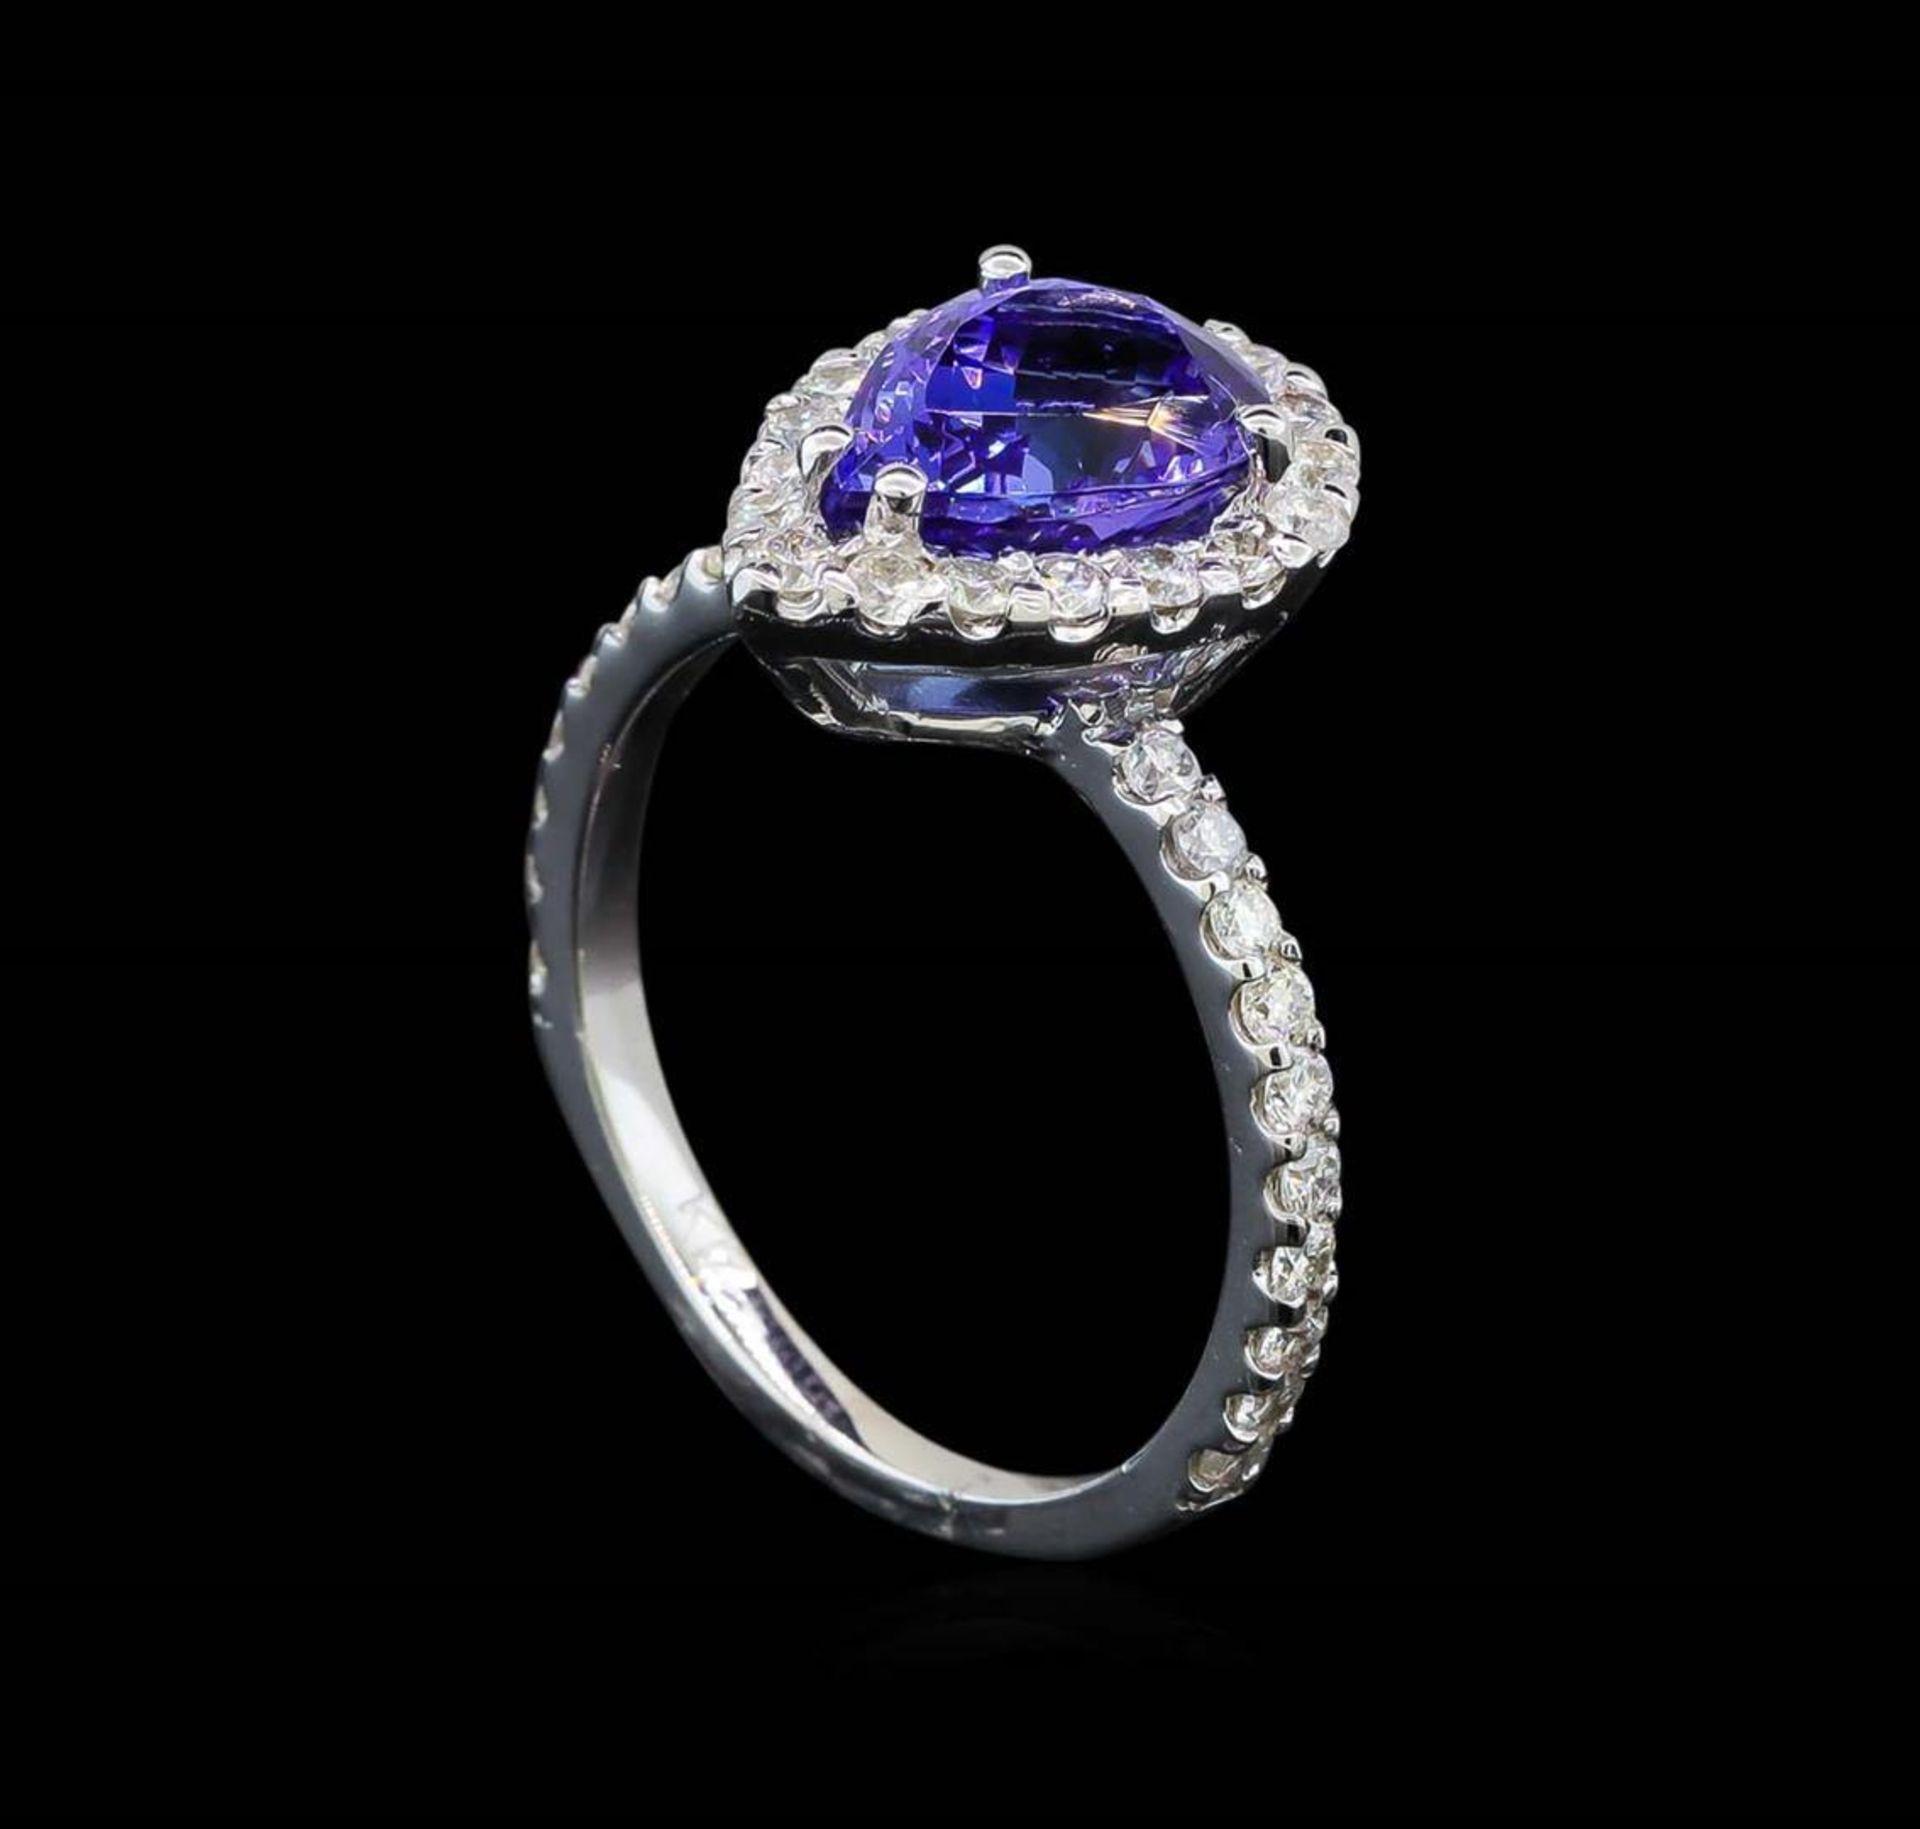 2.20 ctw Tanzanite and Diamond Ring - 14KT White Gold - Image 4 of 5